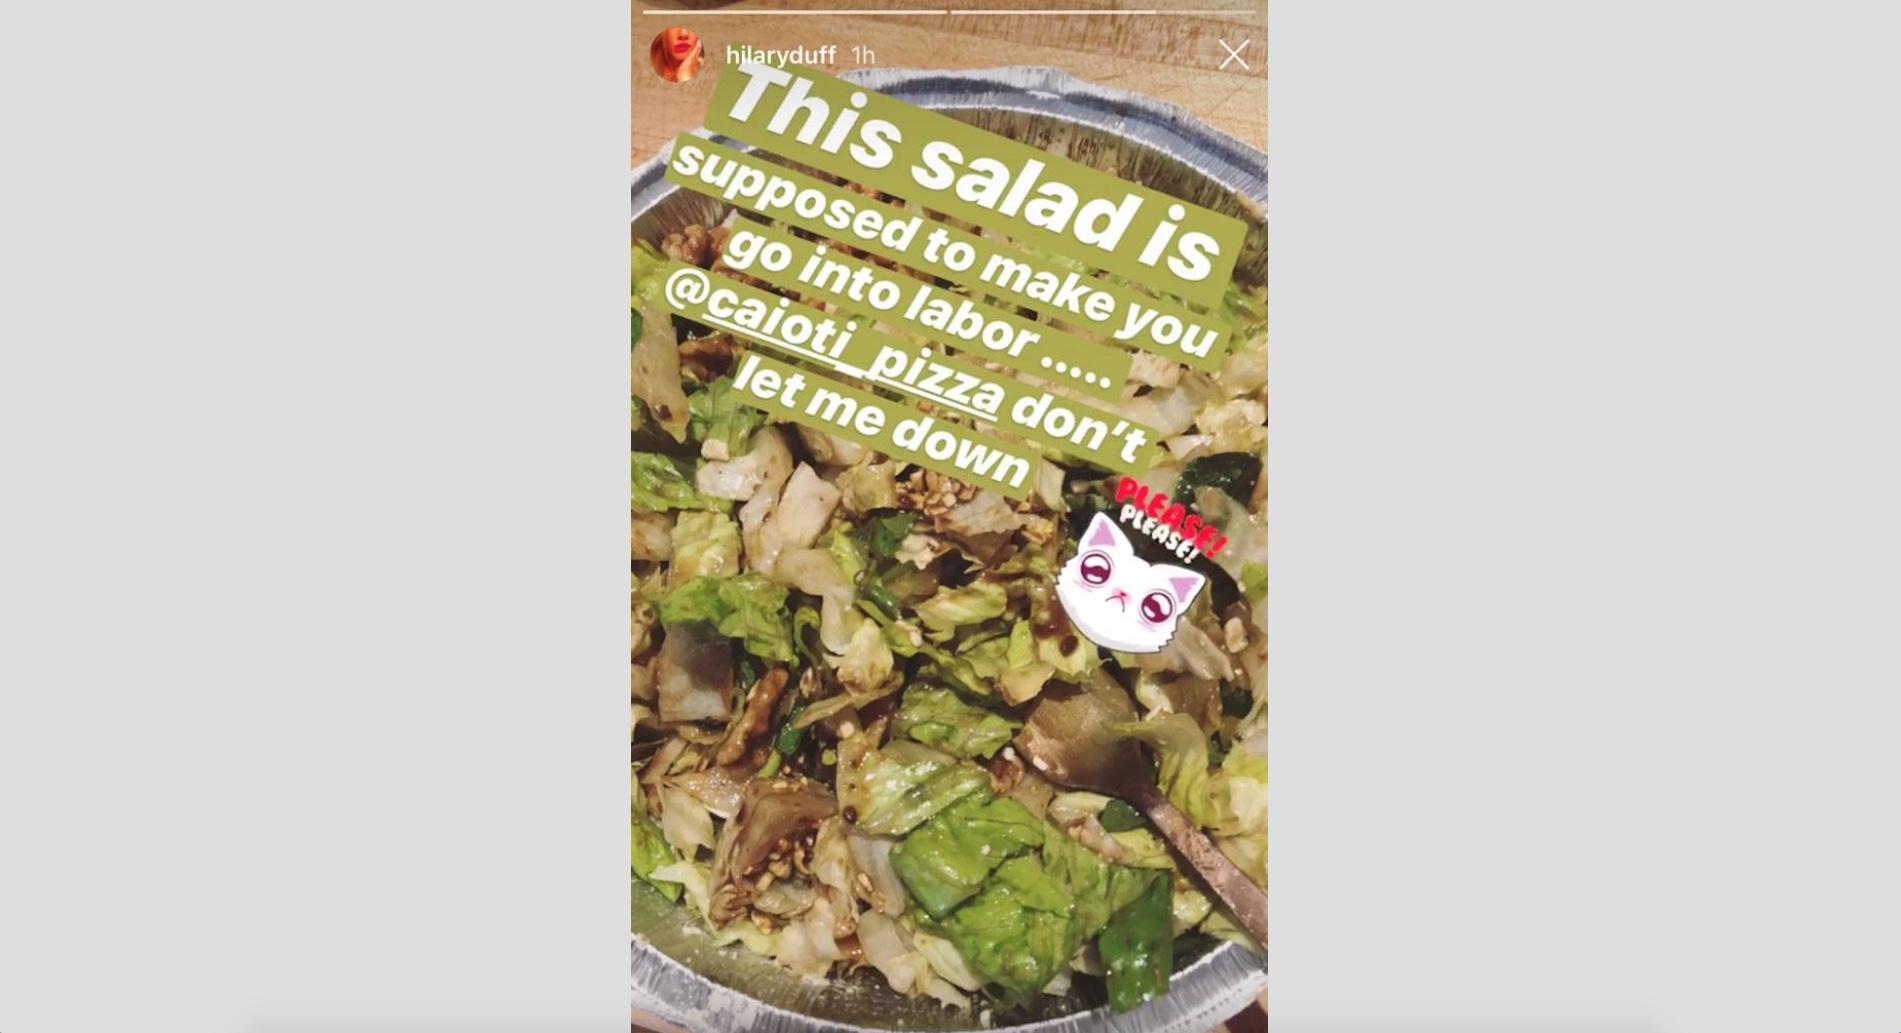 MR-Hilary Duff Salad